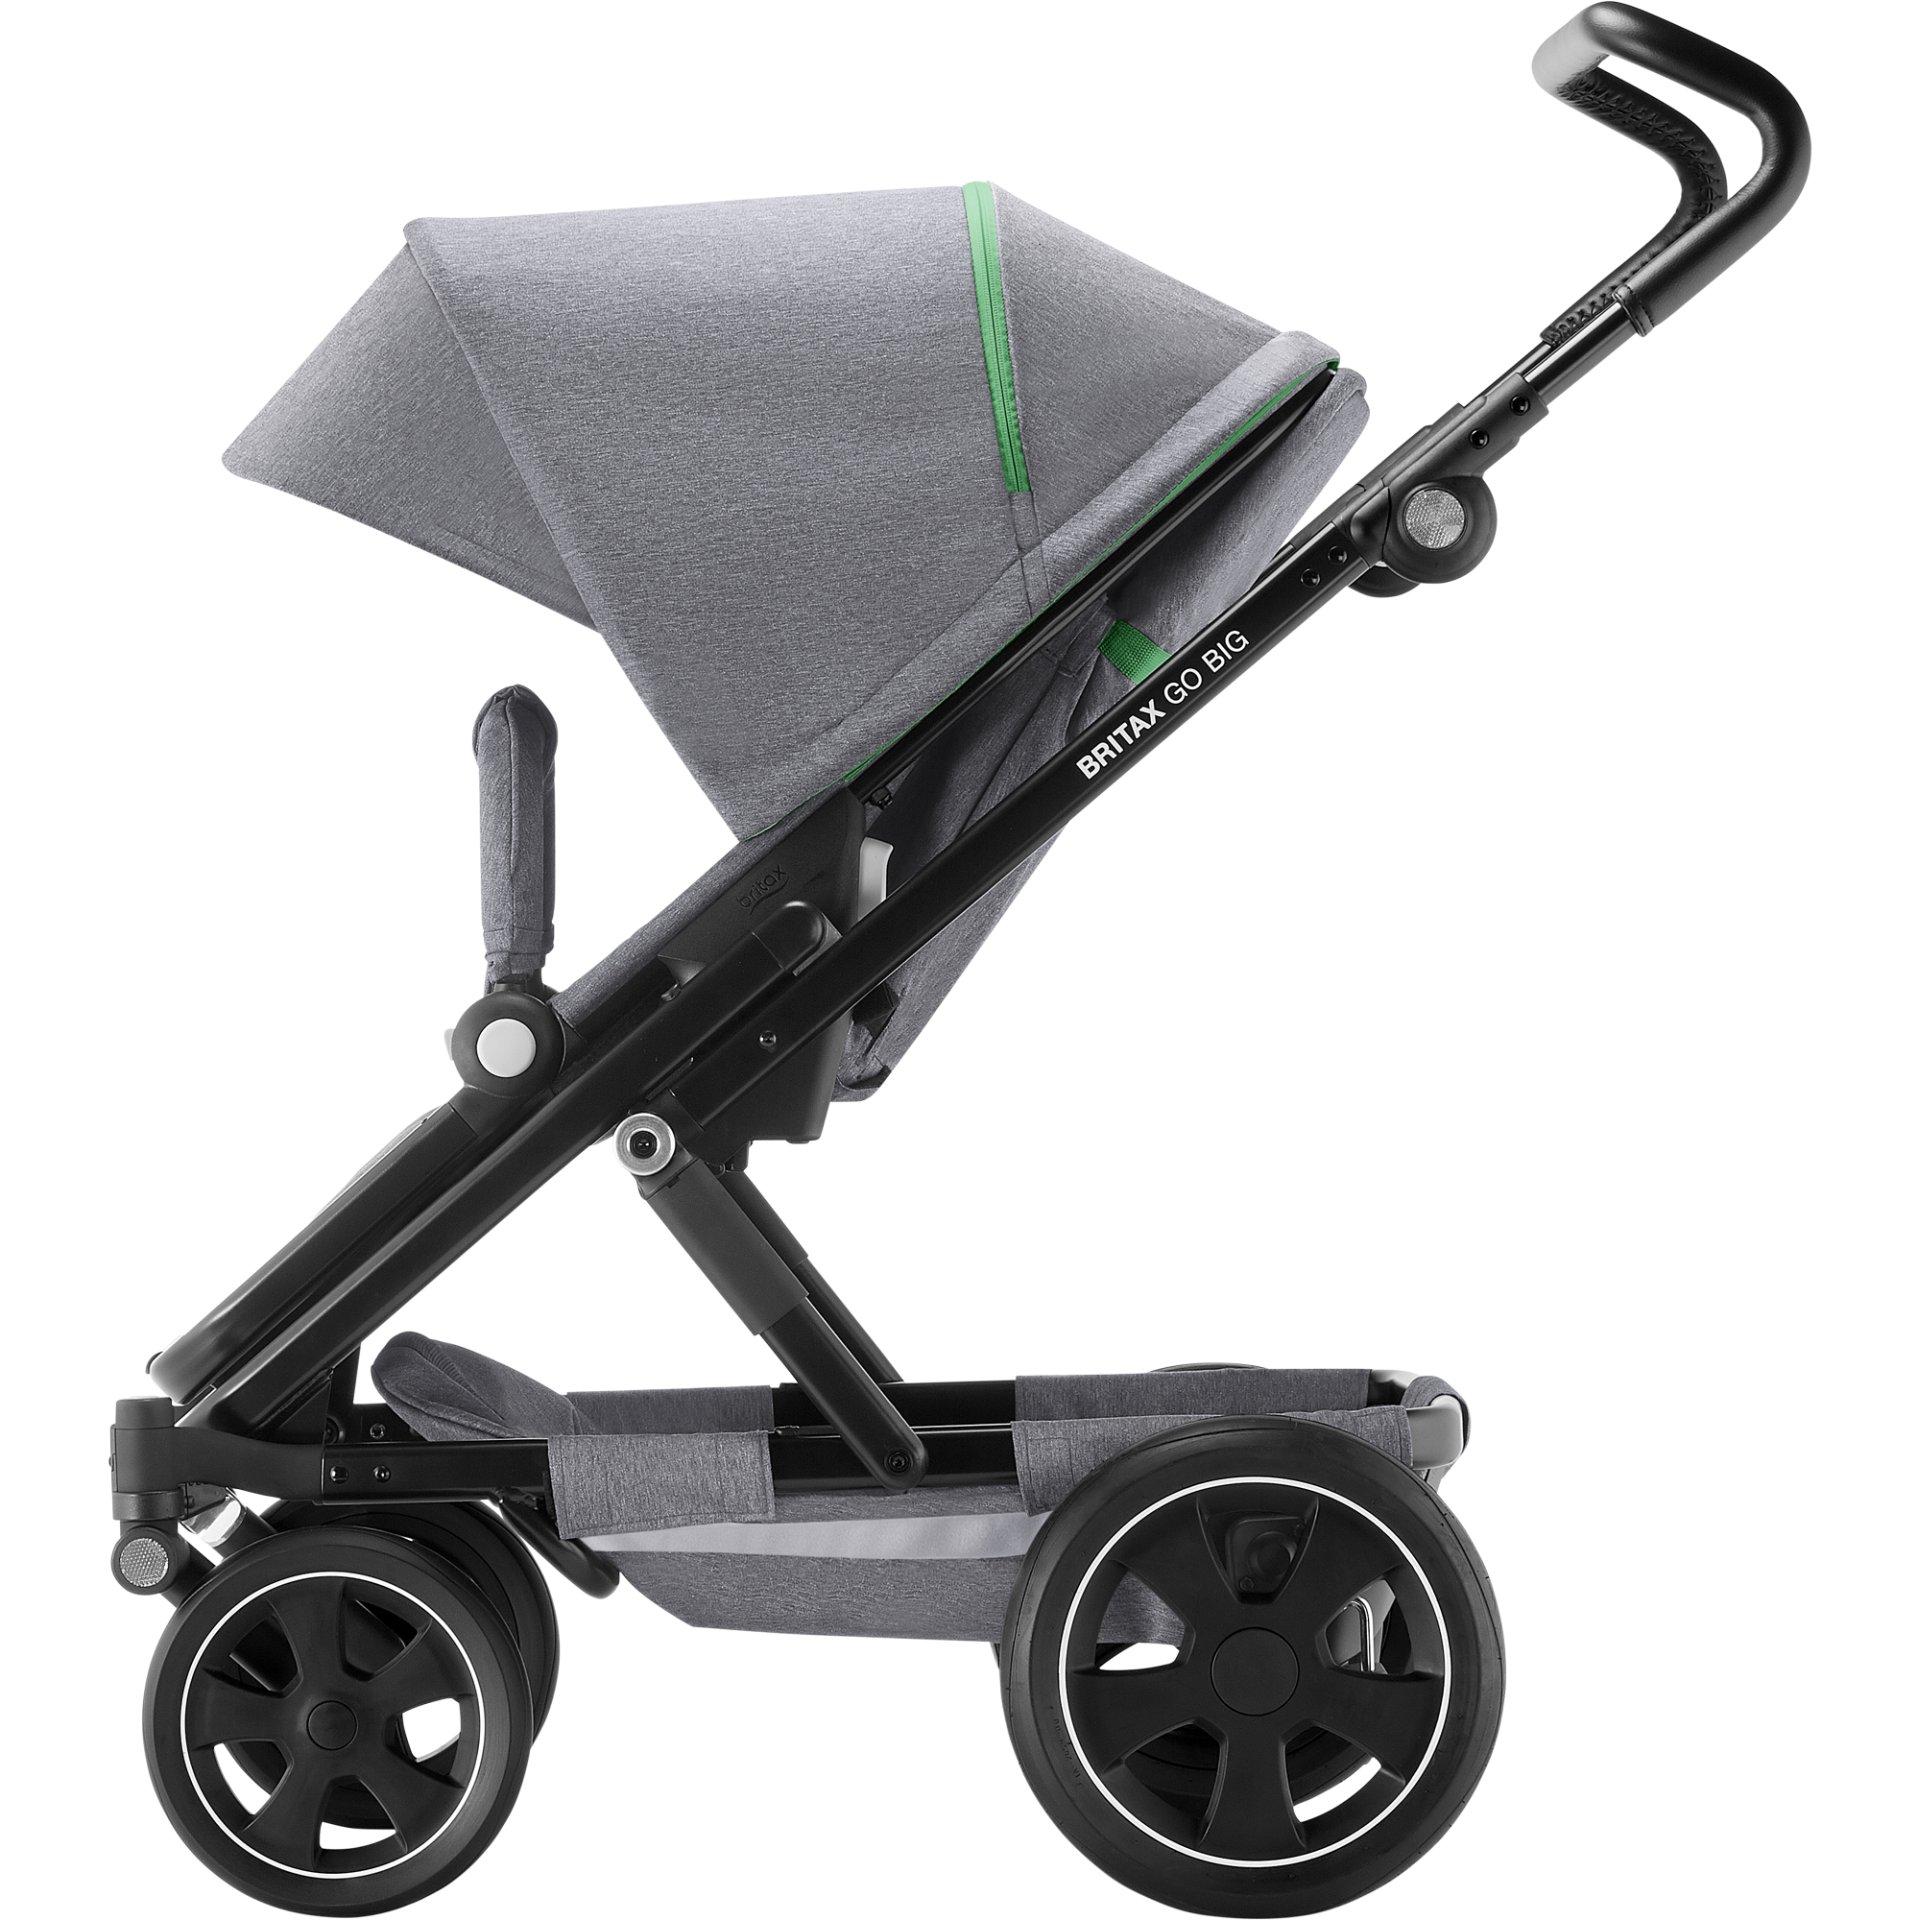 britax r mer multi functional pram go big 2 2018 dynamic grey buy at kidsroom strollers. Black Bedroom Furniture Sets. Home Design Ideas